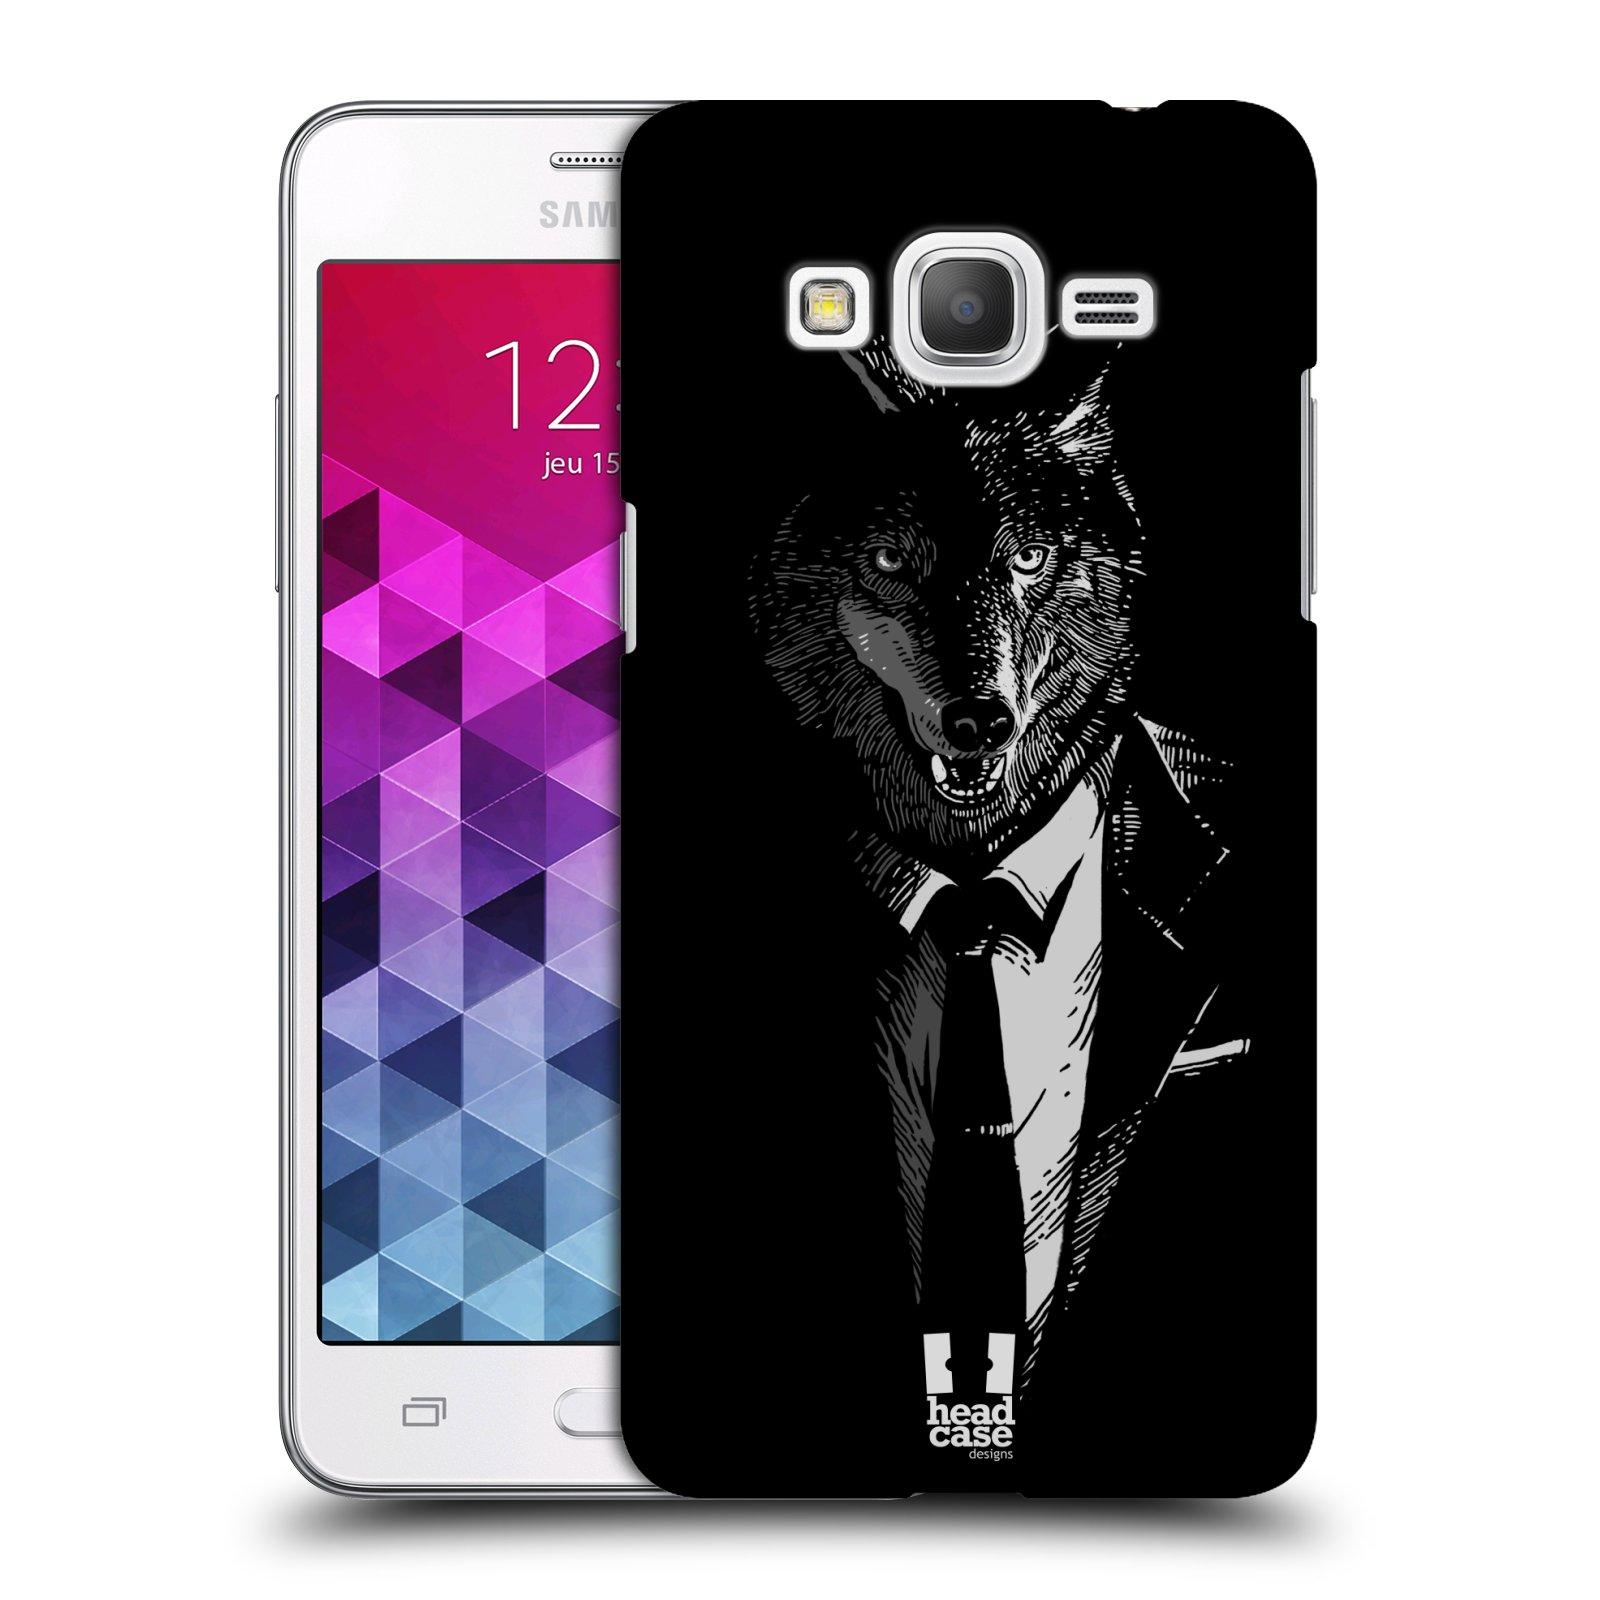 Plastové pouzdro na mobil Samsung Galaxy Grand Prime VE HEAD CASE VLK V KVÁDRU